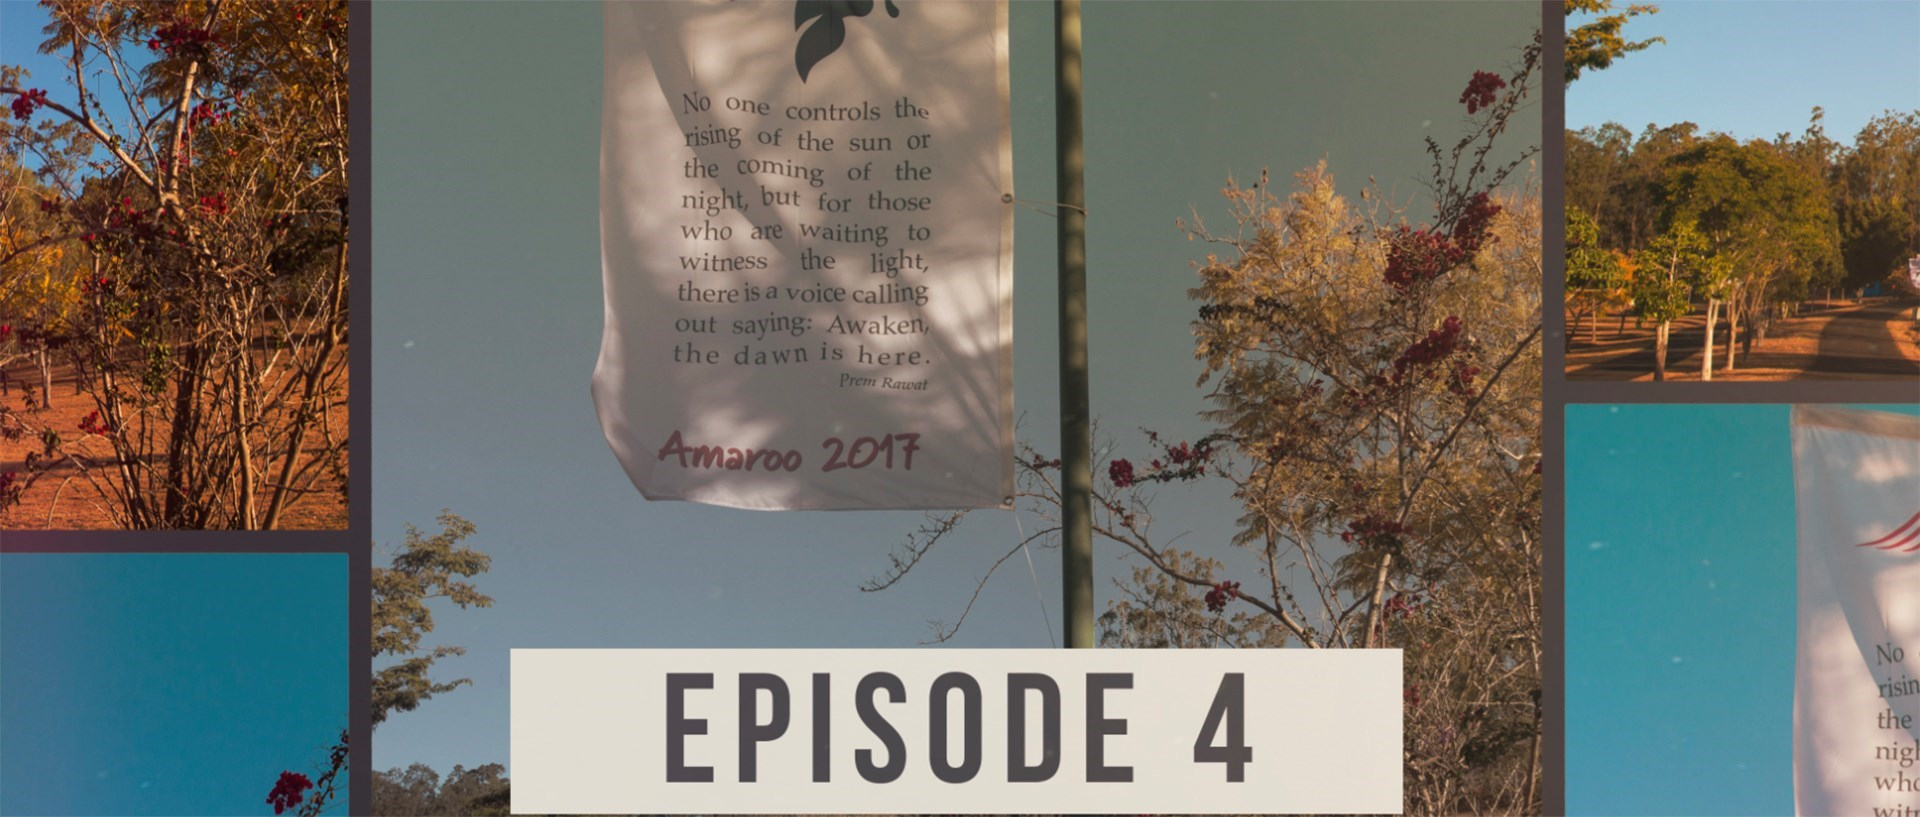 Amaroo 2017 Series Episode 4 Video